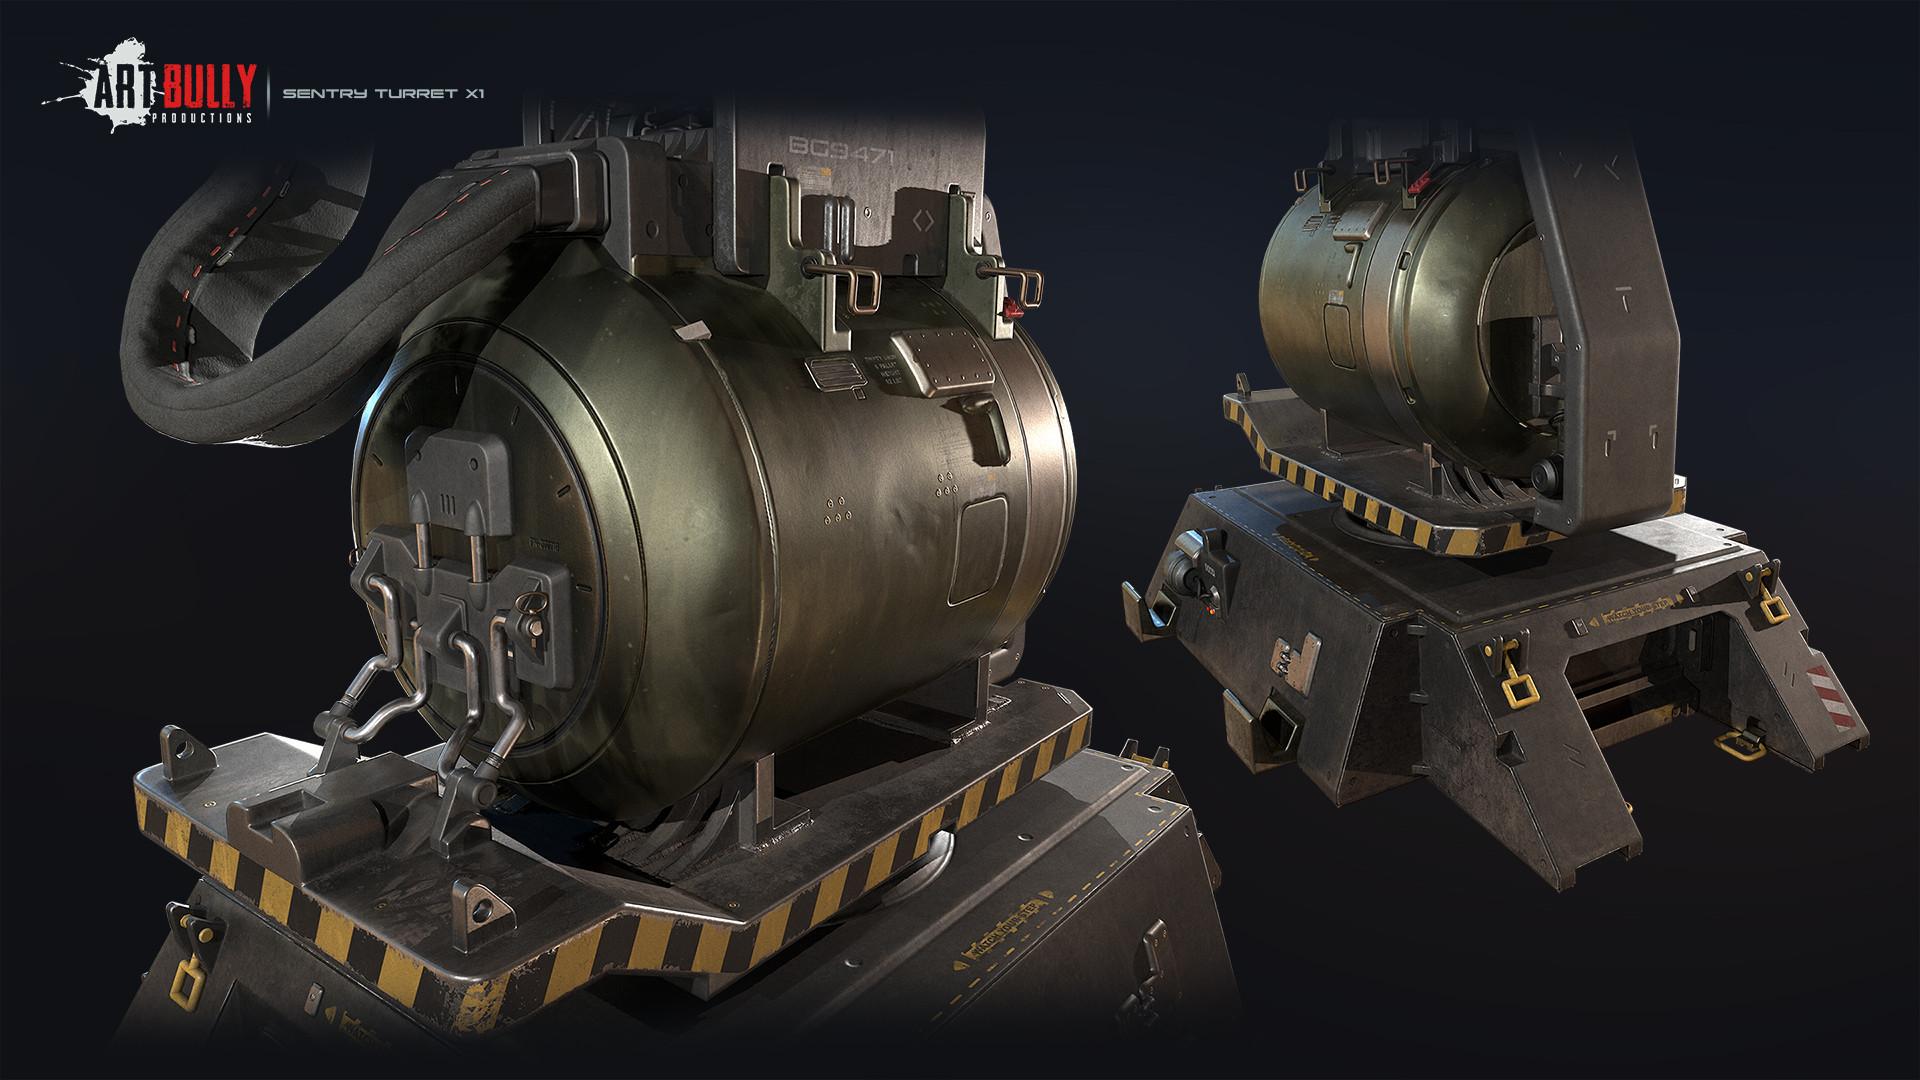 Patrick nuckels sentry turret x1 render 04